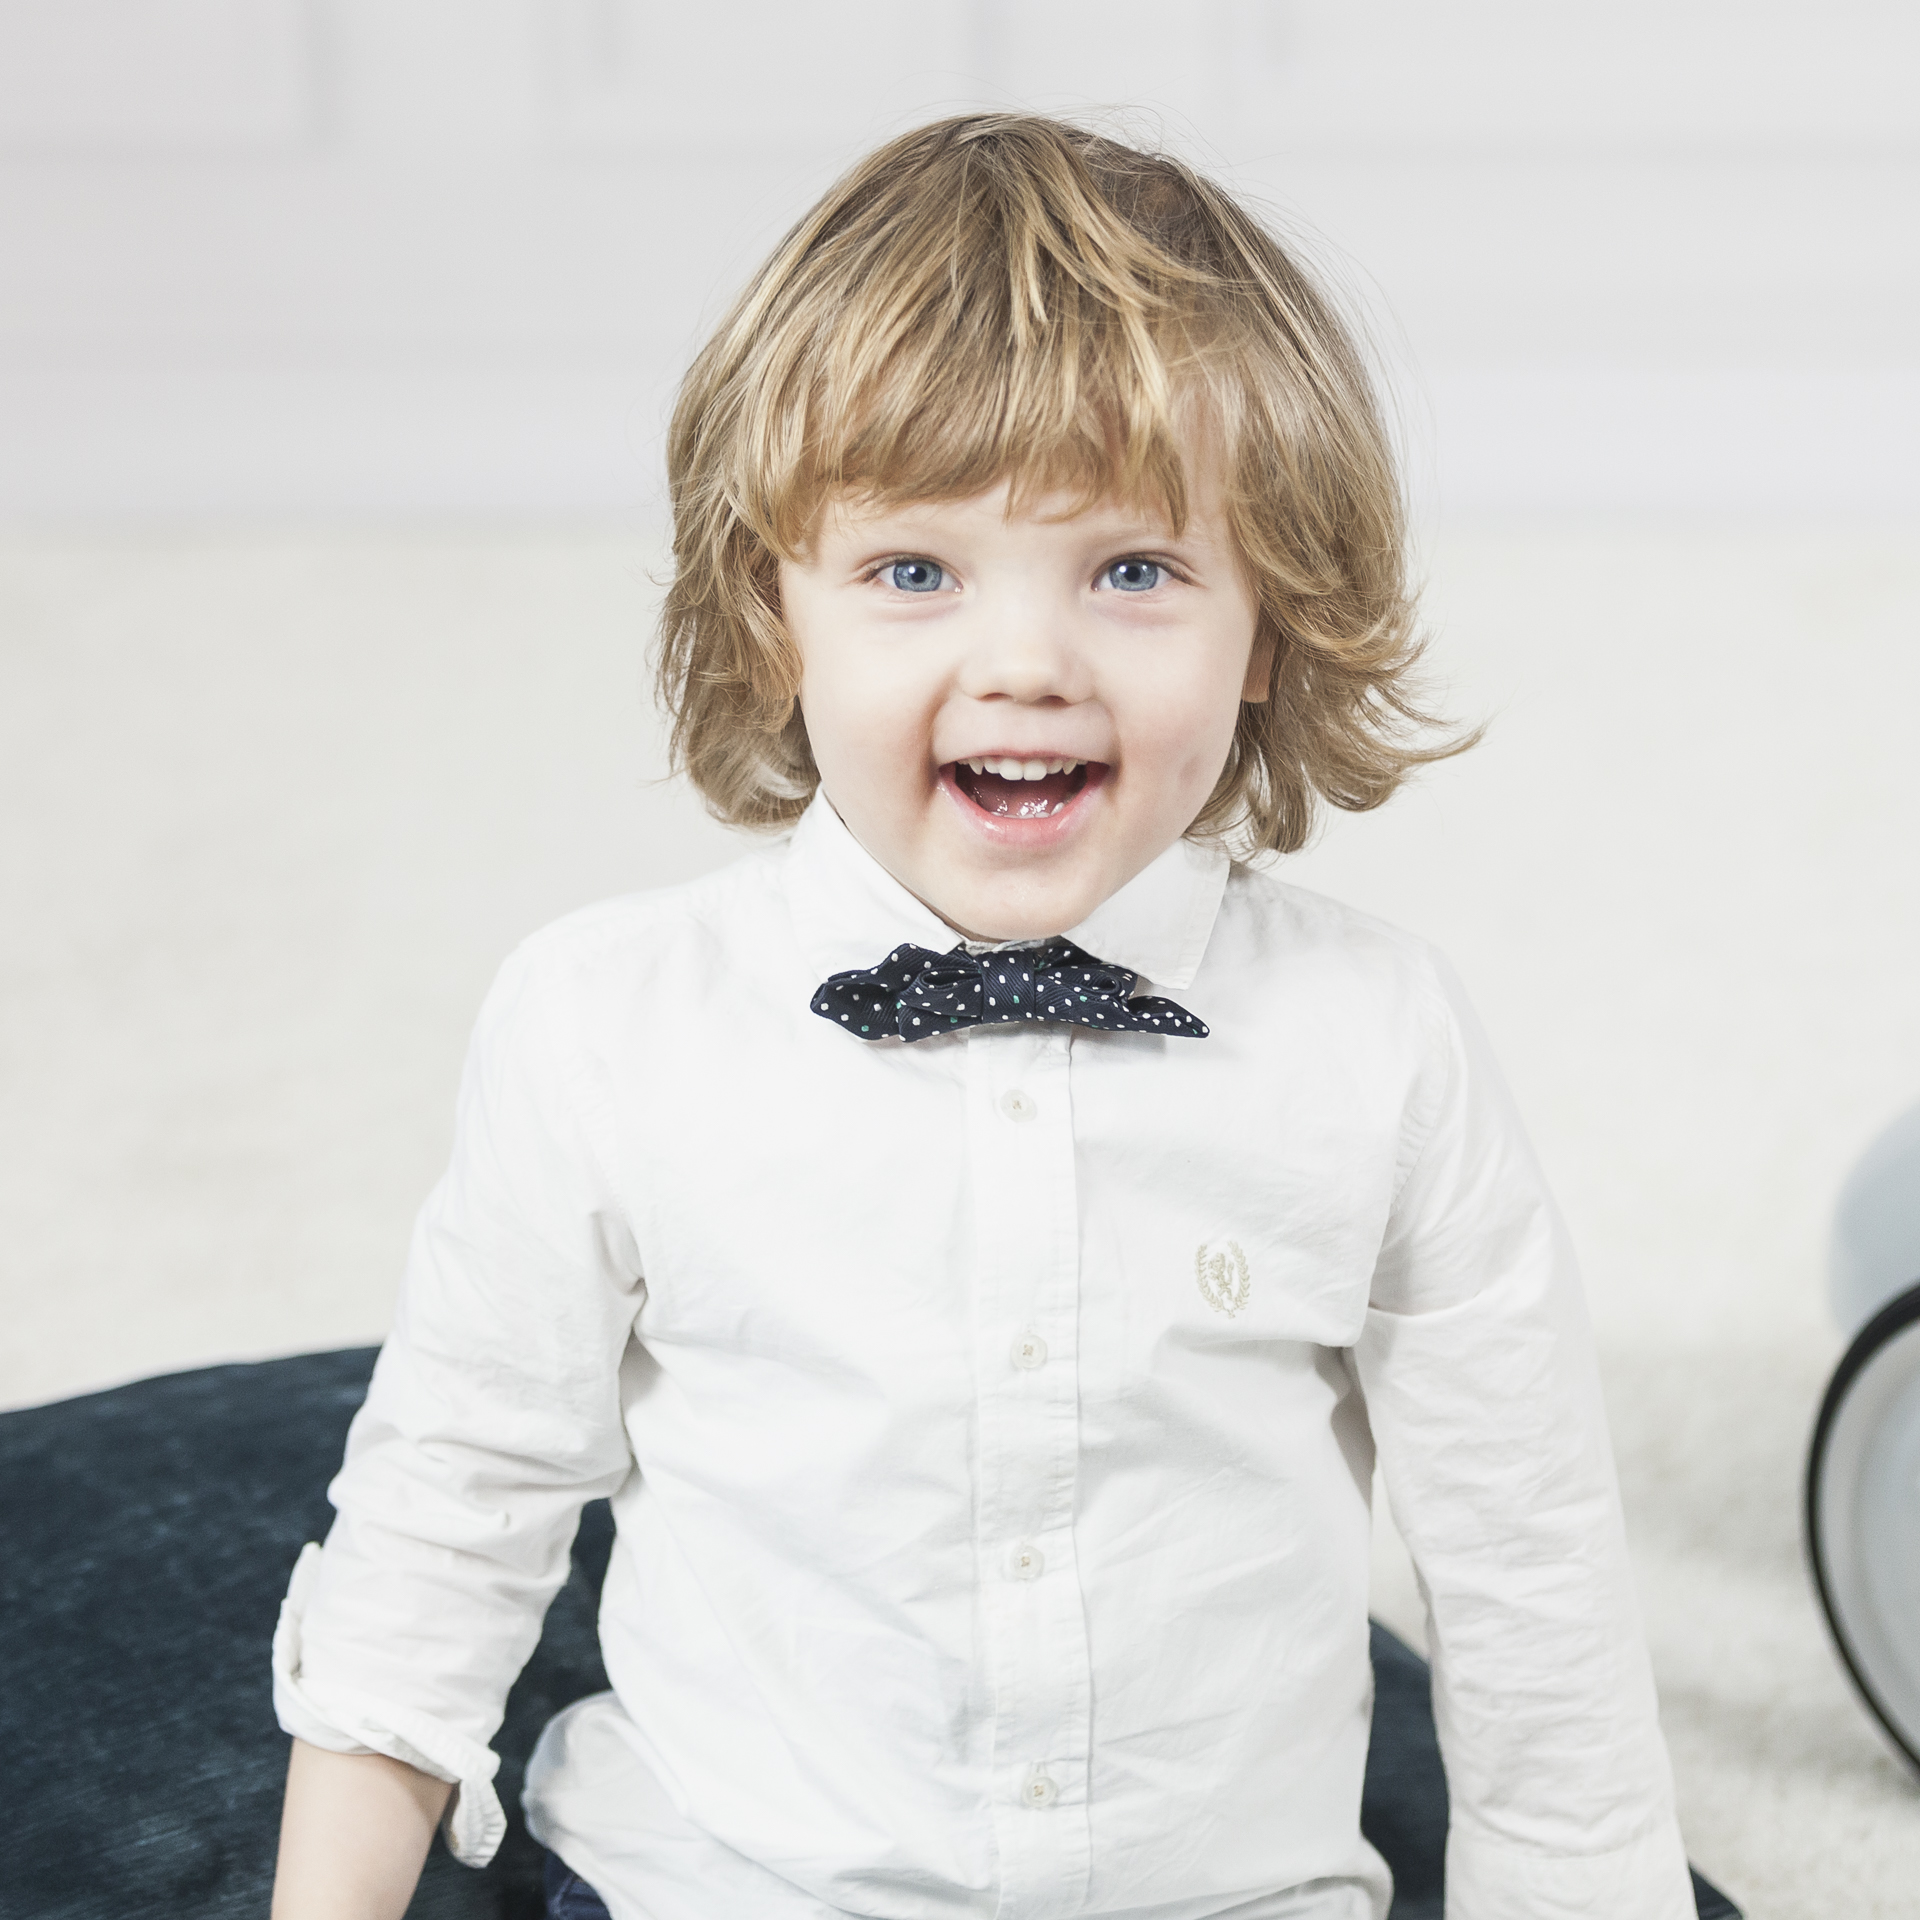 galerie-littlephotographers-03-kindergartenfotografie